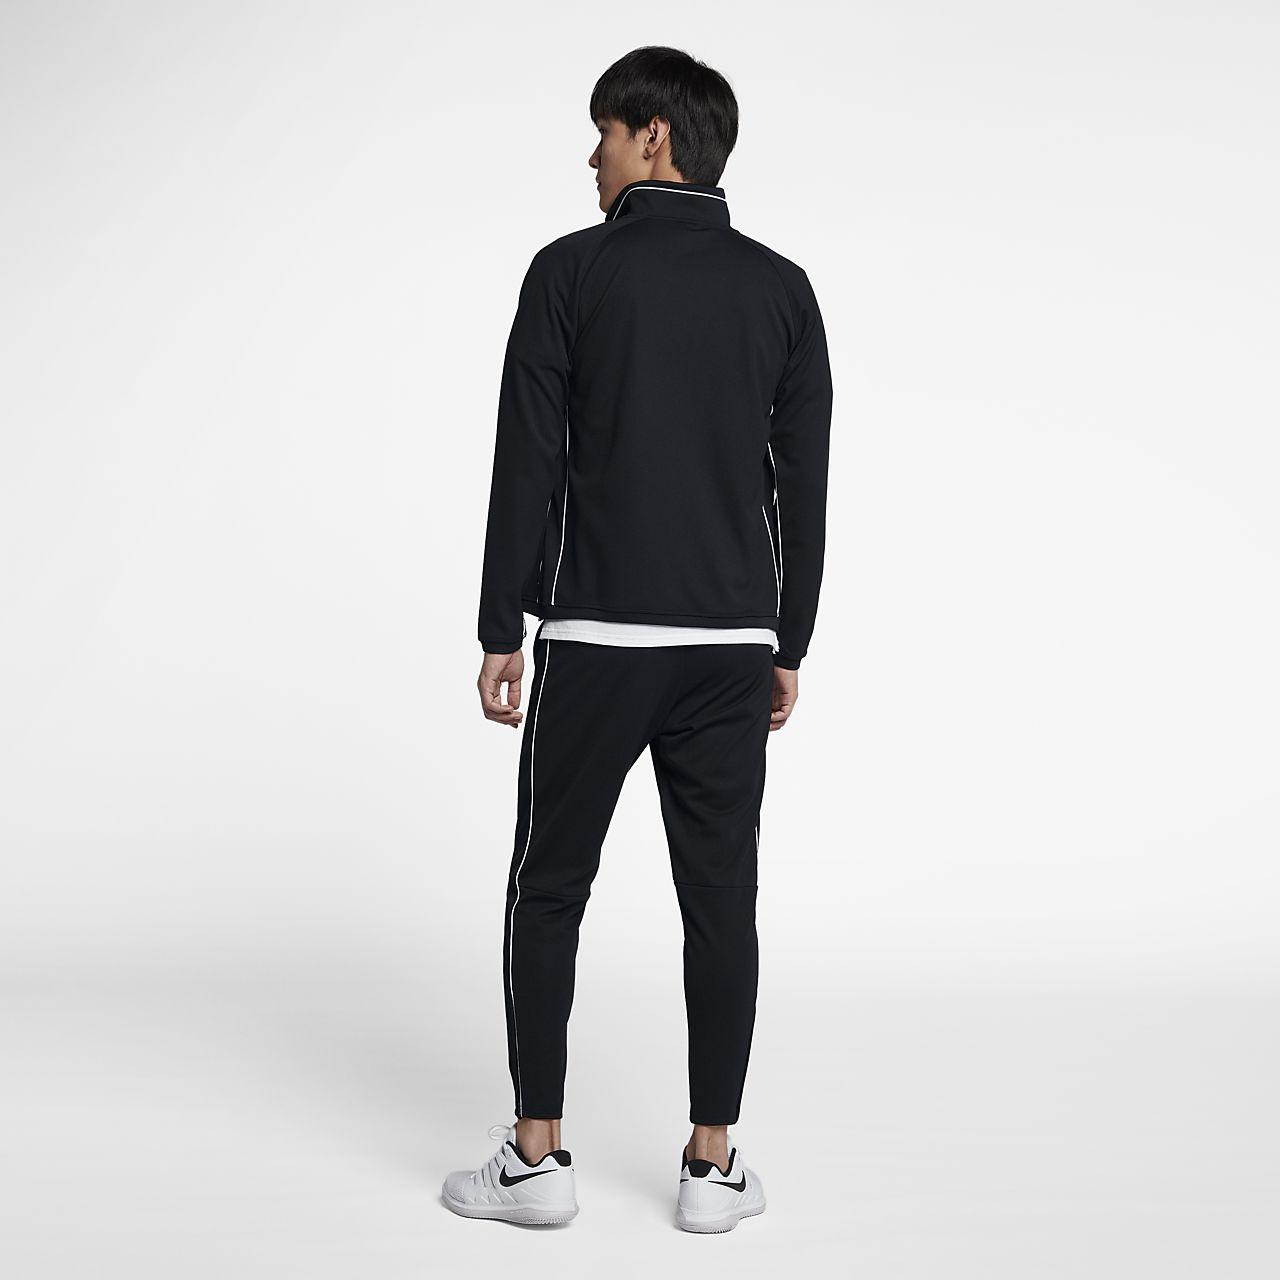 hot sale online a8a3a a28d4 ... Fato de treino de ténis NikeCourt para homem